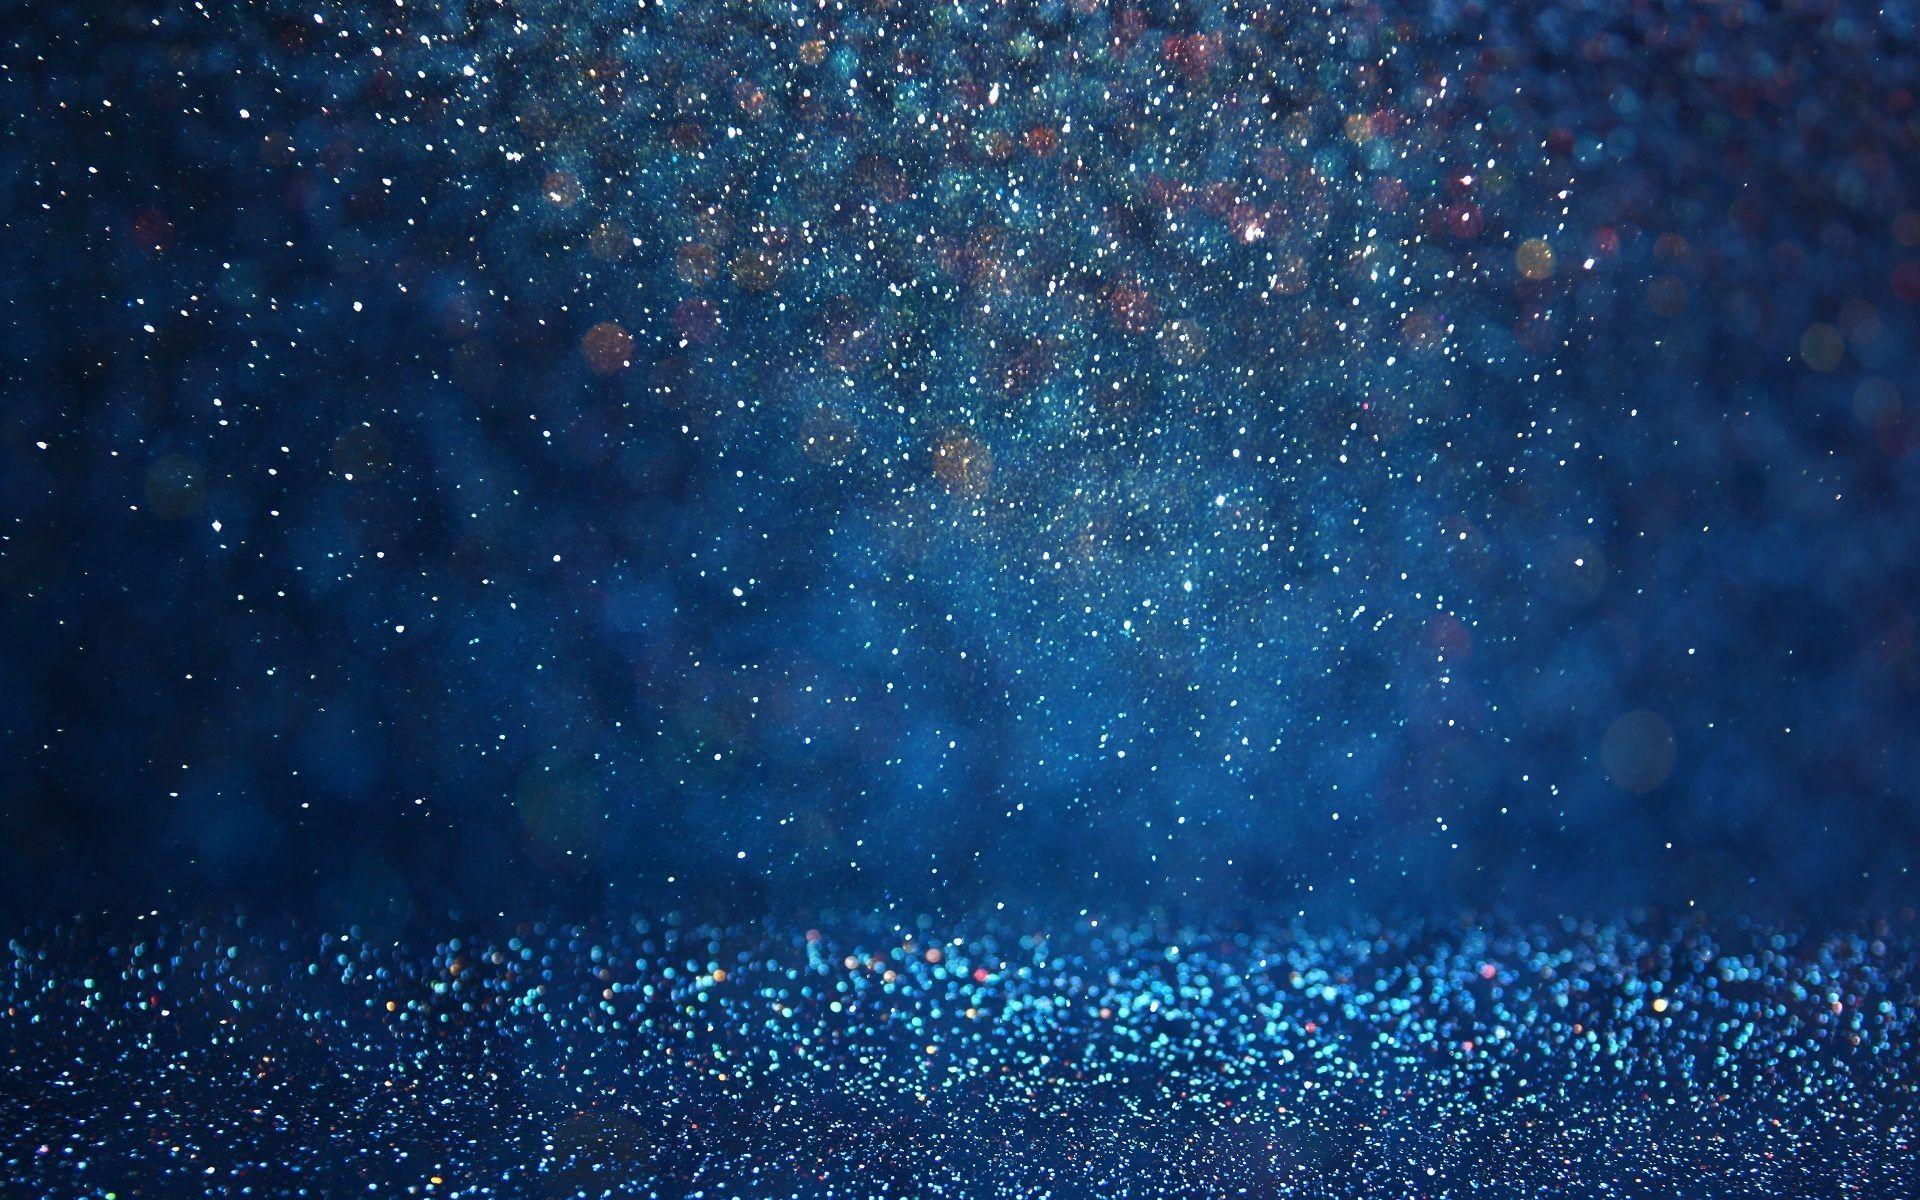 Blue Rain Wallpapers Top Free Blue Rain Backgrounds